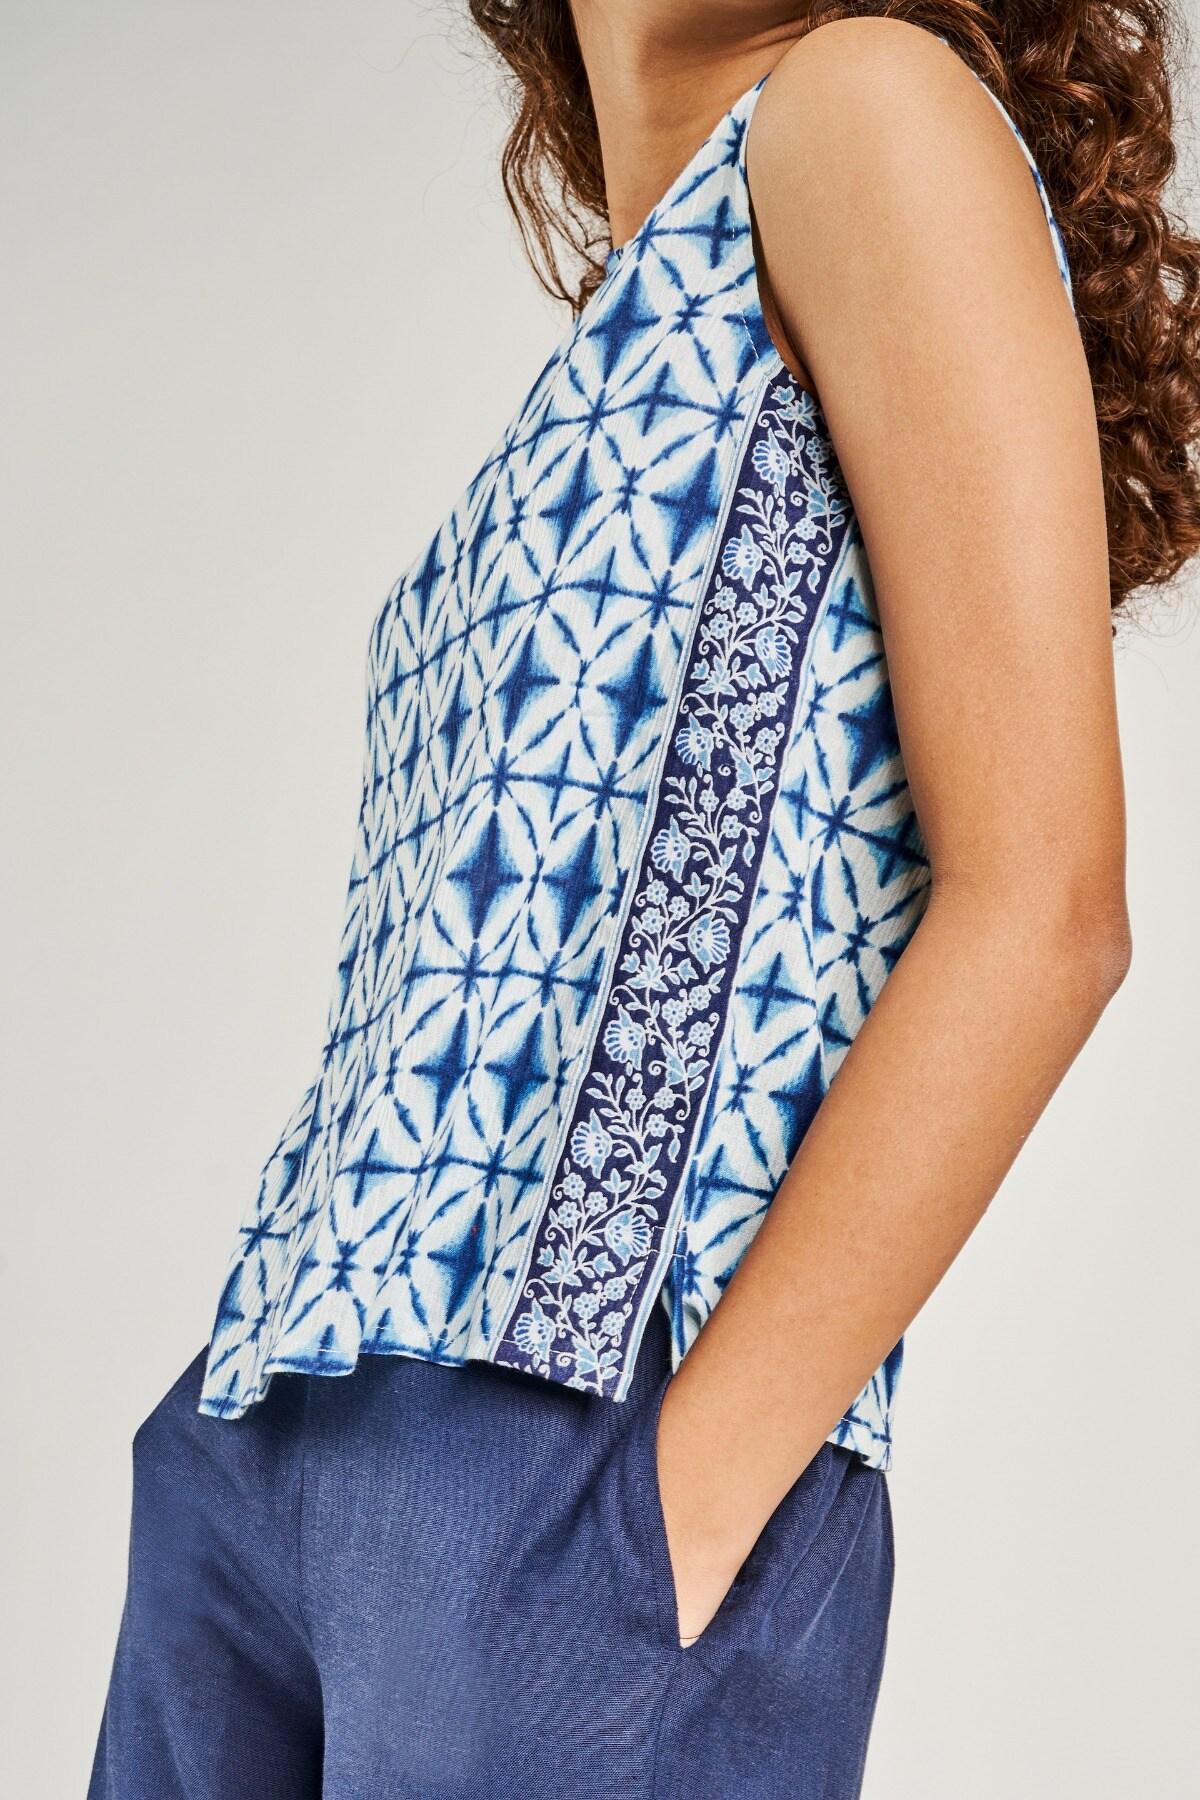 Global Desi | Blue Geometric Printed Crop Top